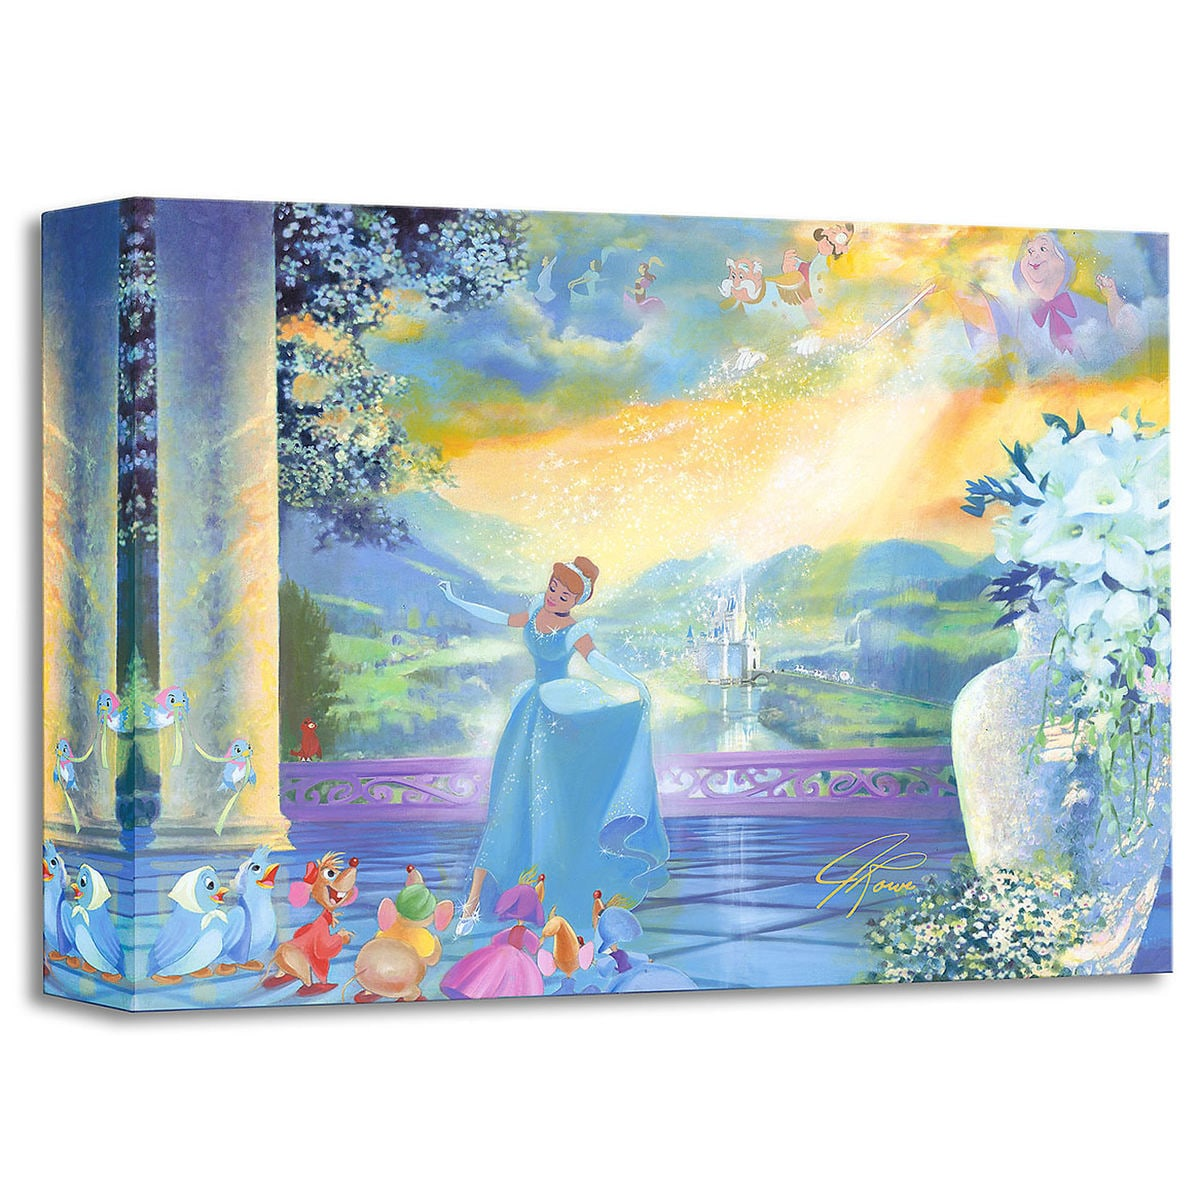 Cinderella \'\'The Life She Dreams Of\'\' Giclée by John Rowe | shopDisney